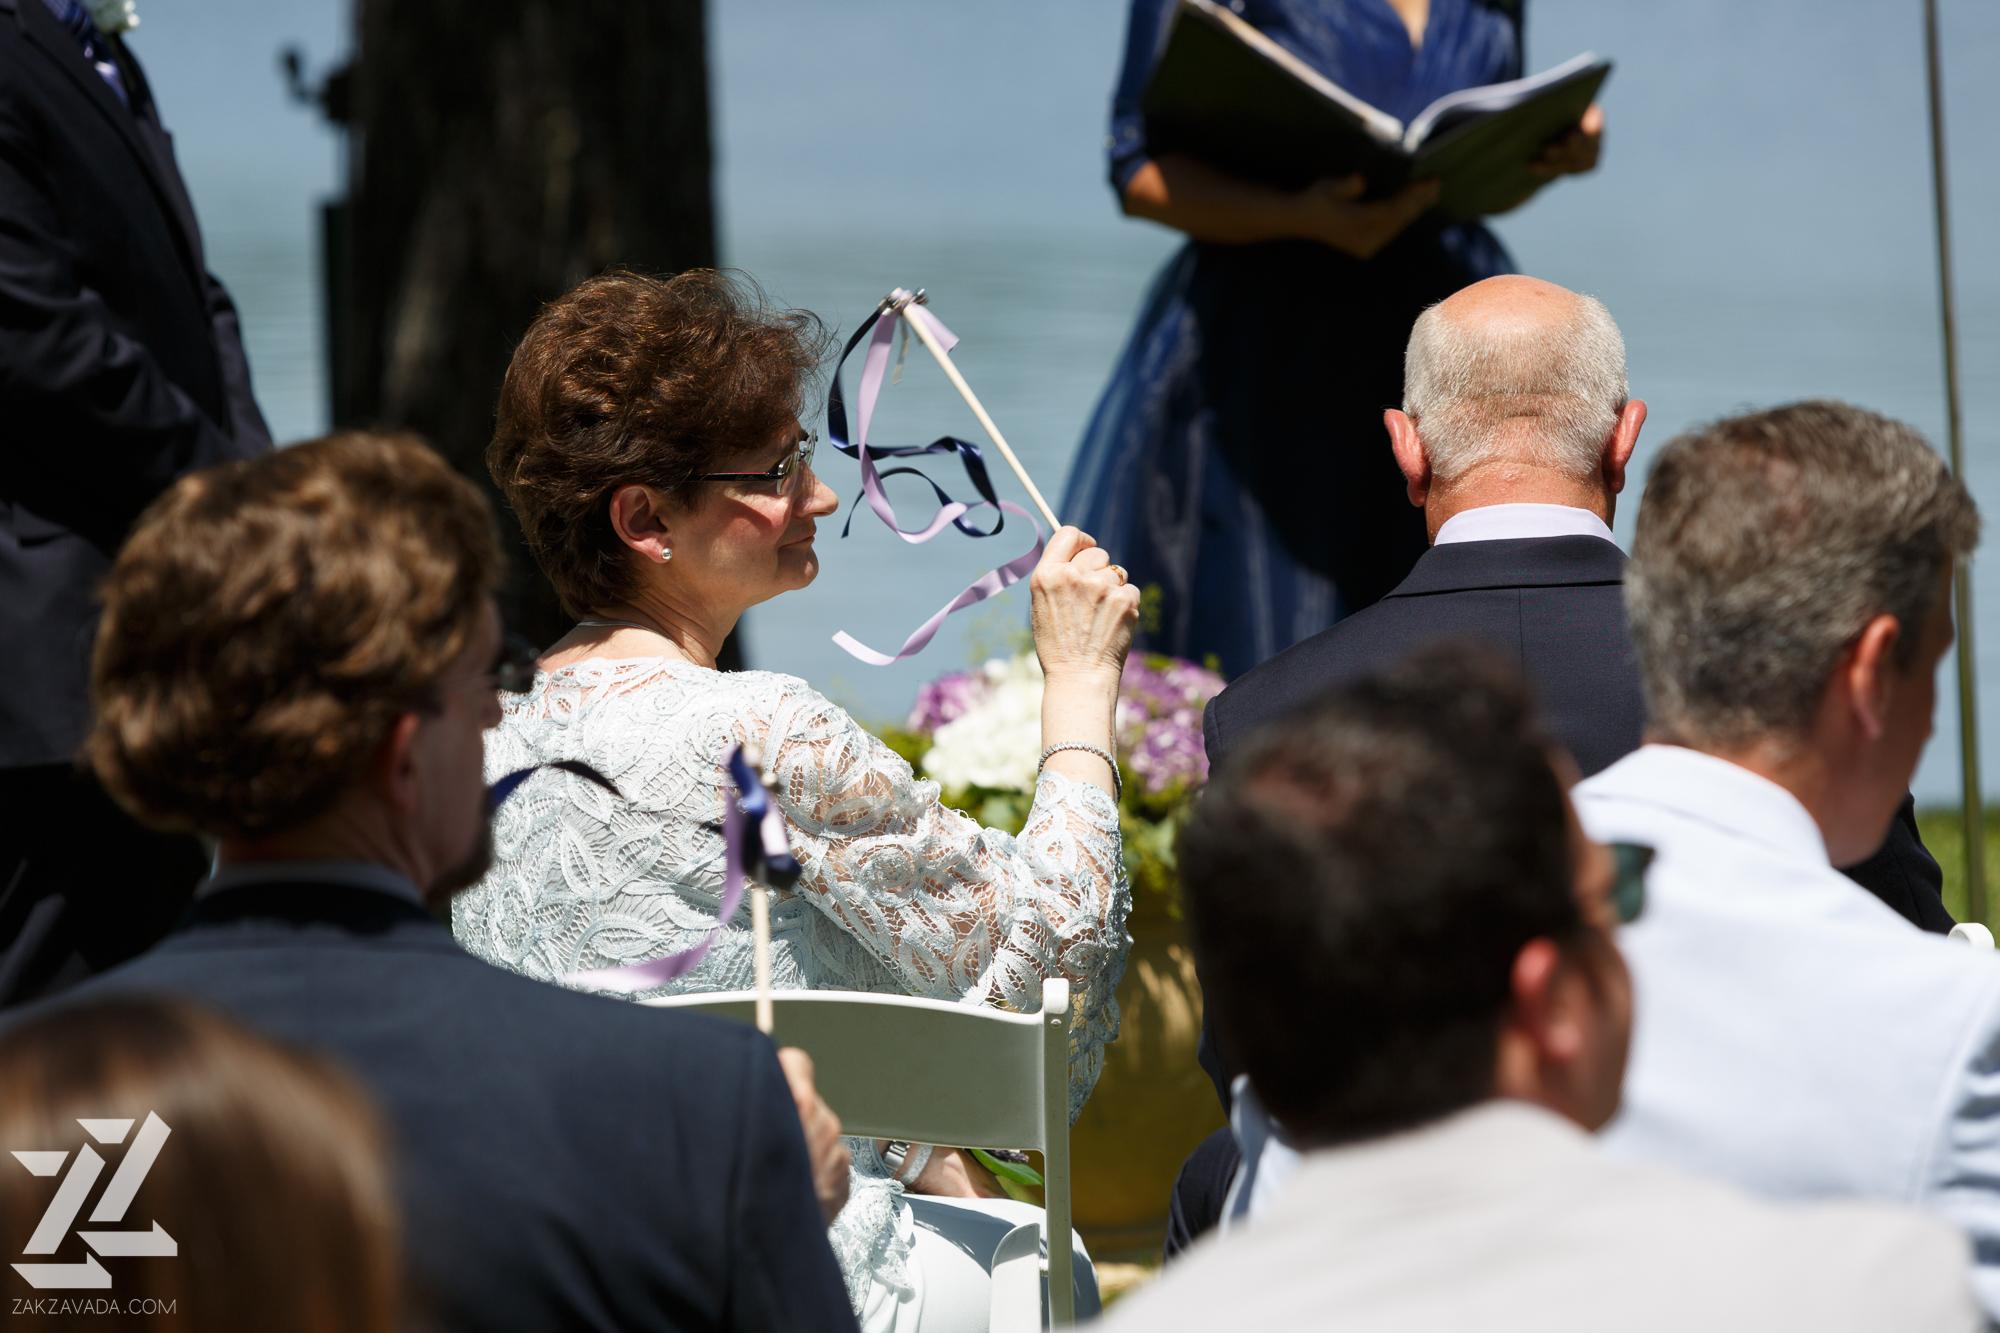 scranton-wedding-photography-zak-zavada-ruddyBelcastroWedding-393.jpg